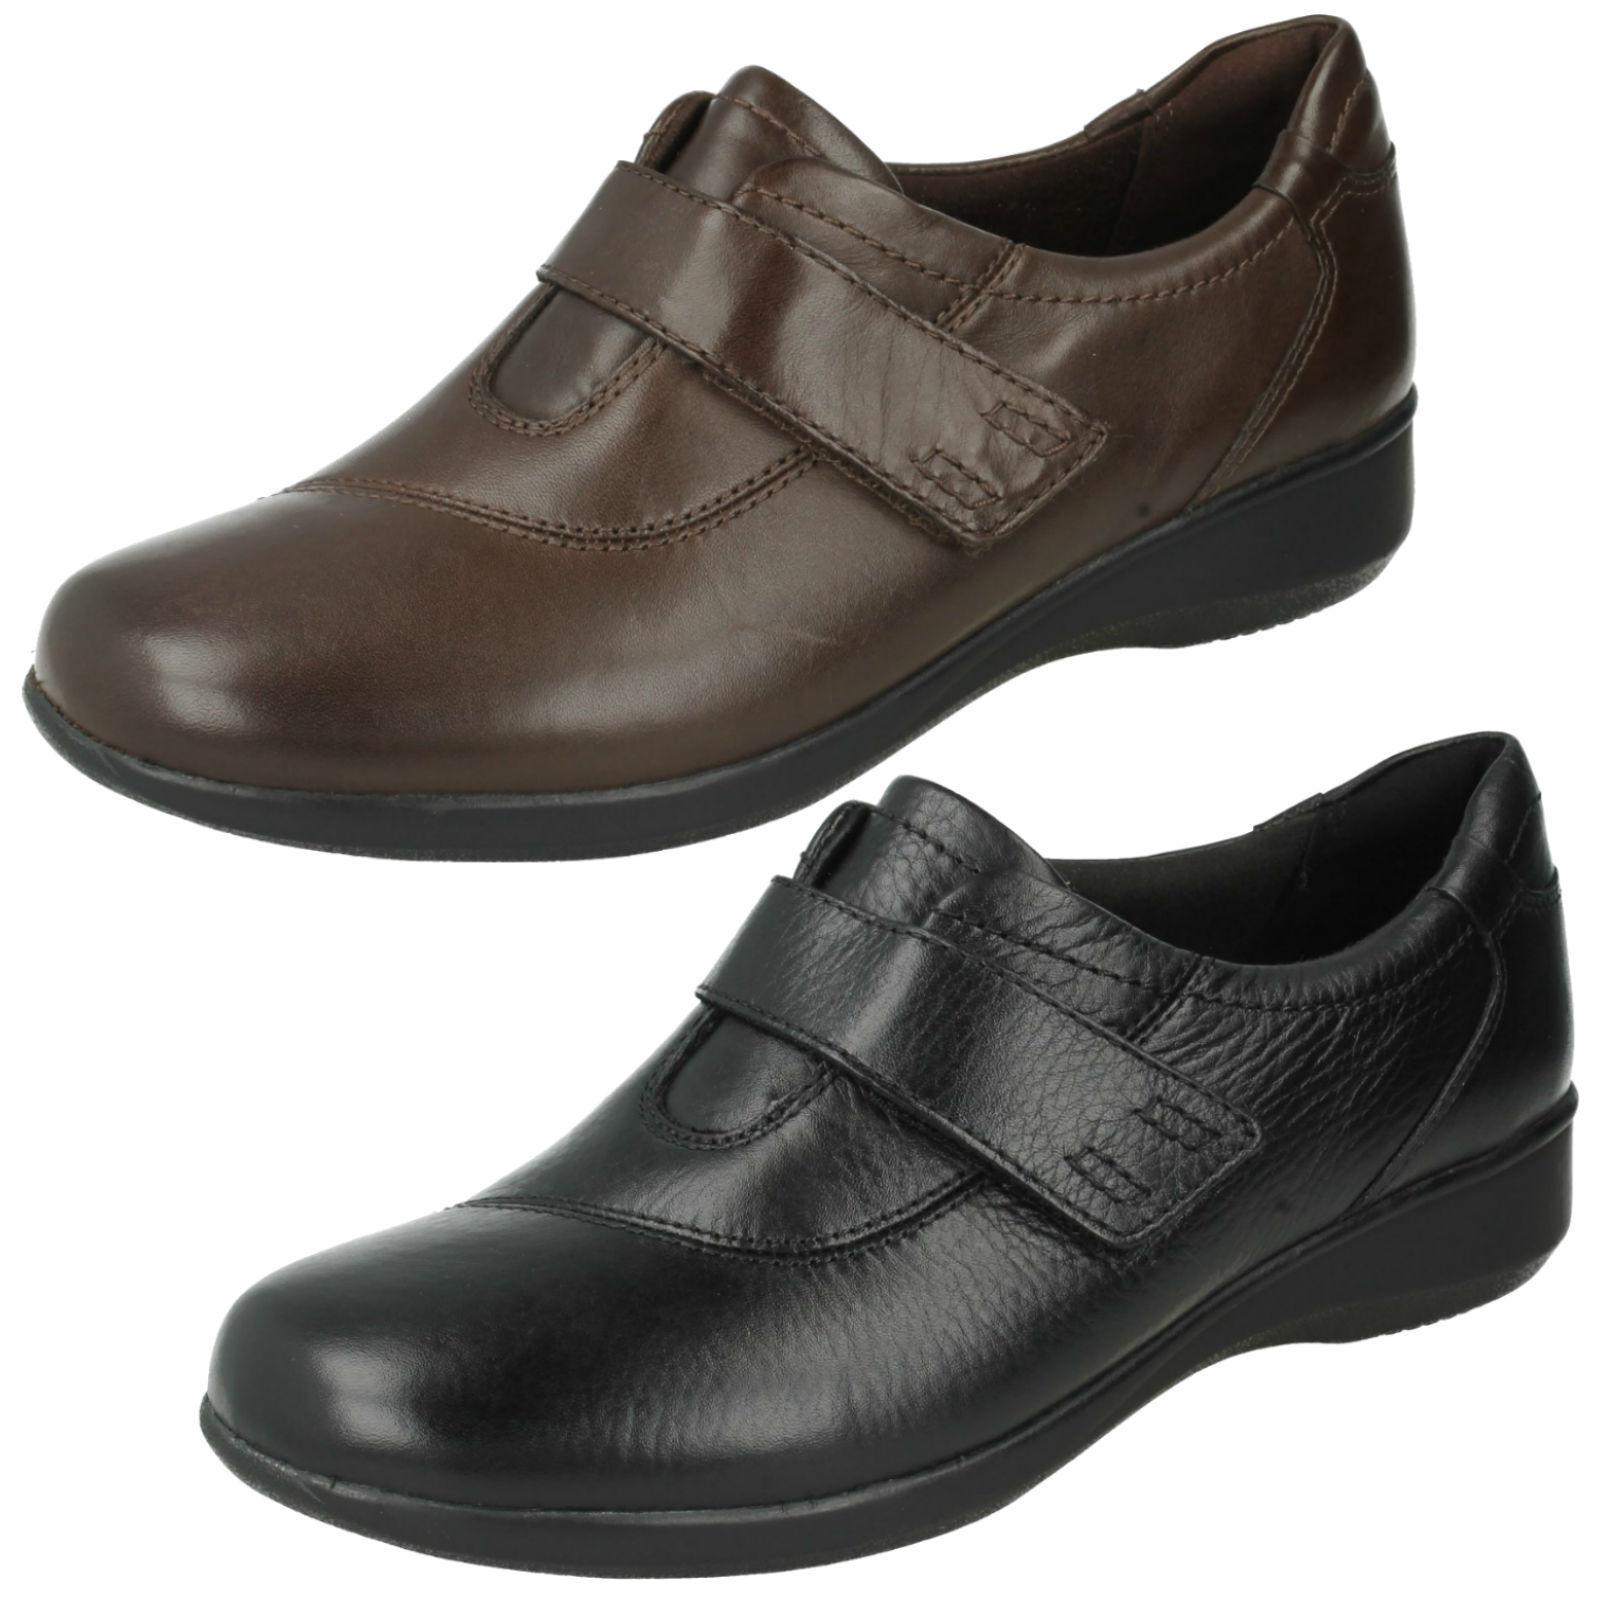 Damen Clarks Leder ripatpe Riemen weite Passform Freizeithosen Schuhe